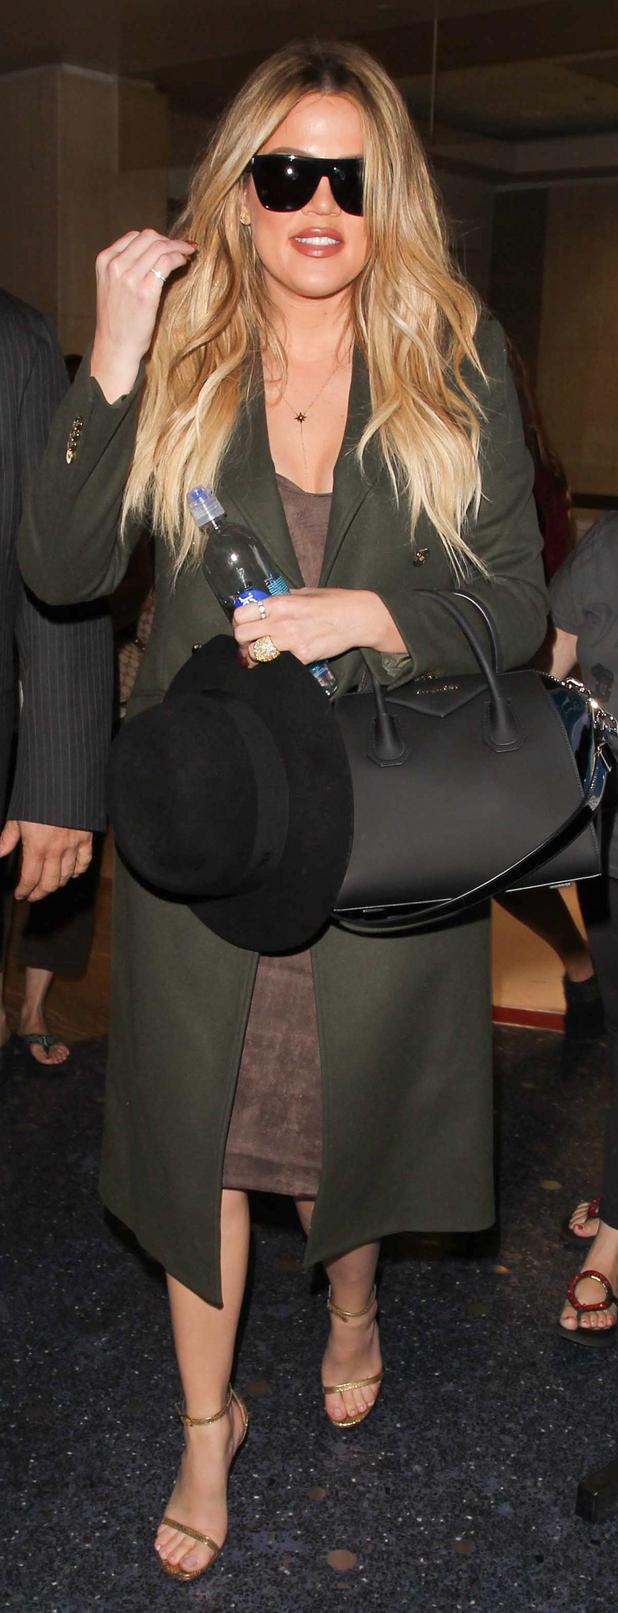 Khloe Kardashian in green trenchcoat at LAX airport 28 april